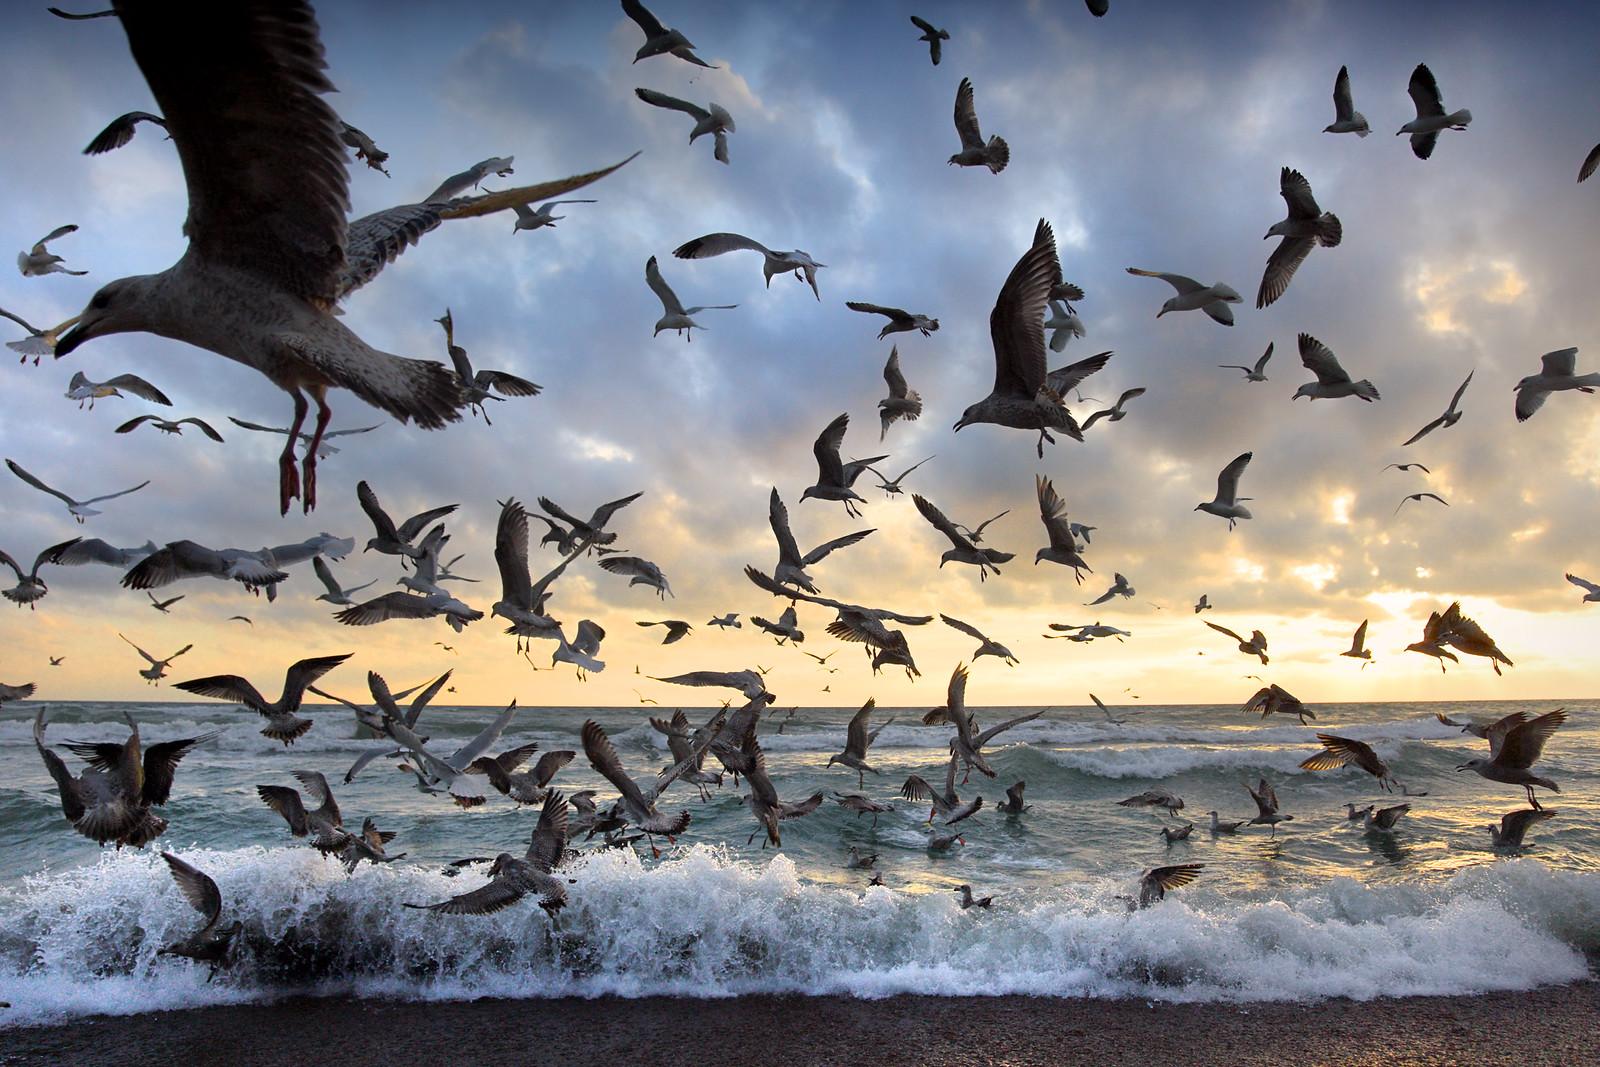 Feeding Frenzy on Brighton Beach - BEST VIEWED LARGE